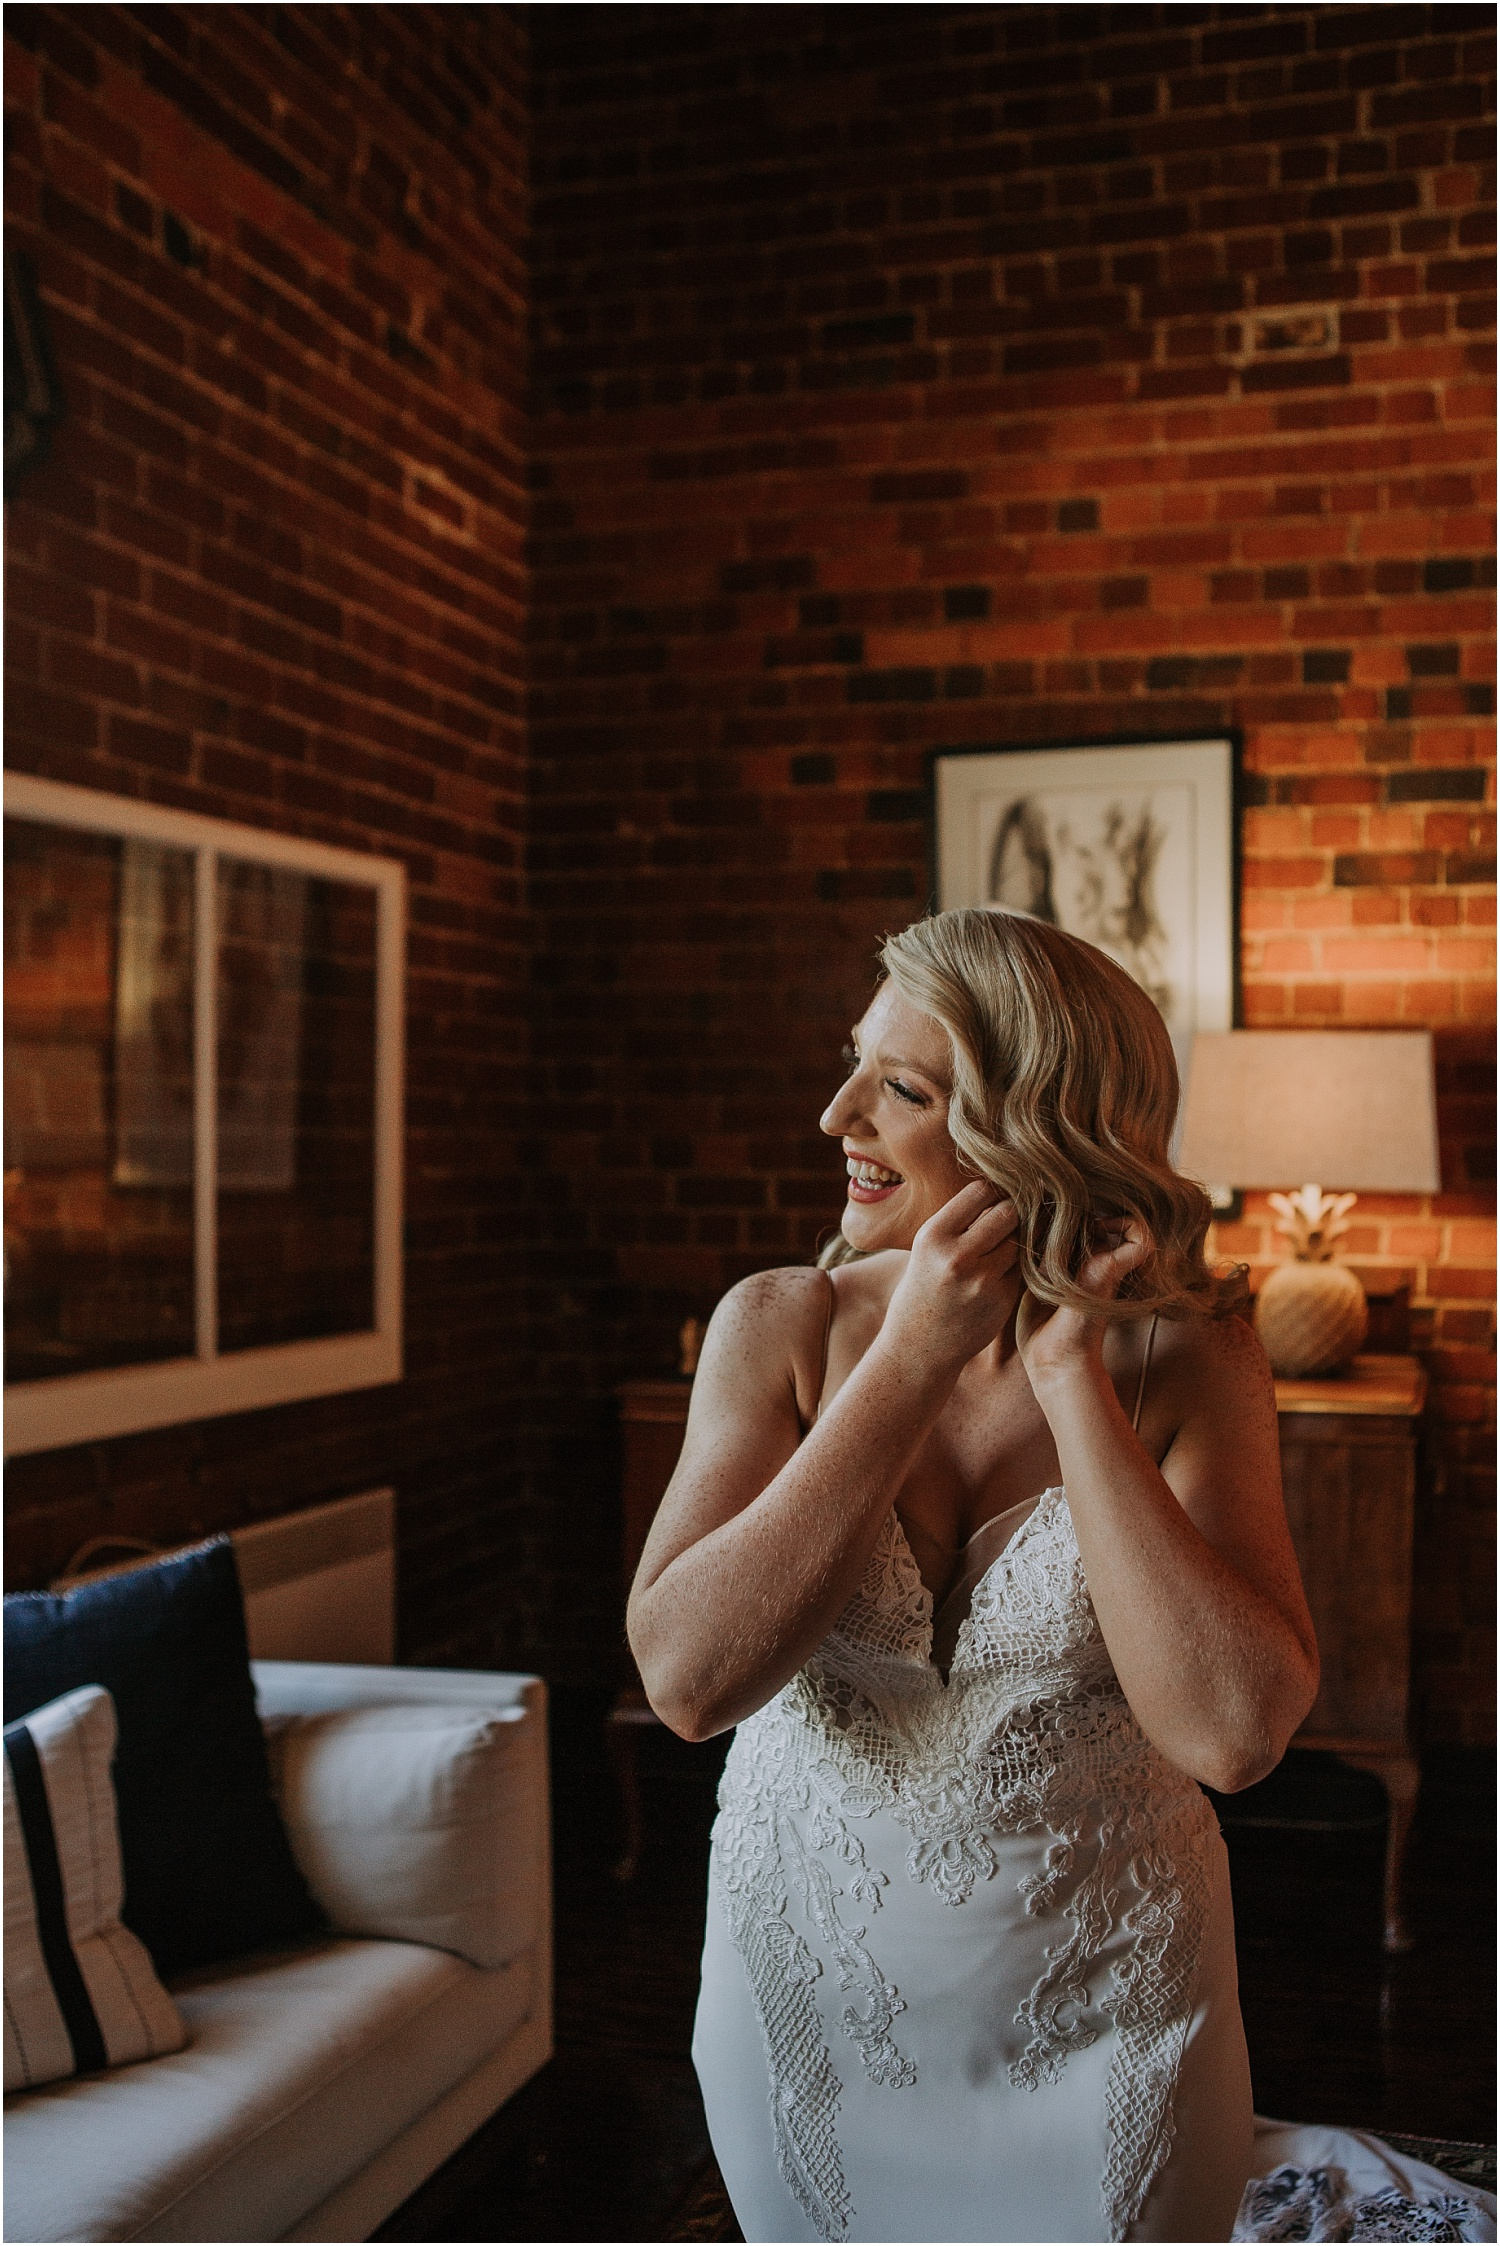 Katherine and Sam's stylish elopment at the Euroa Butter Factory._0025.jpg